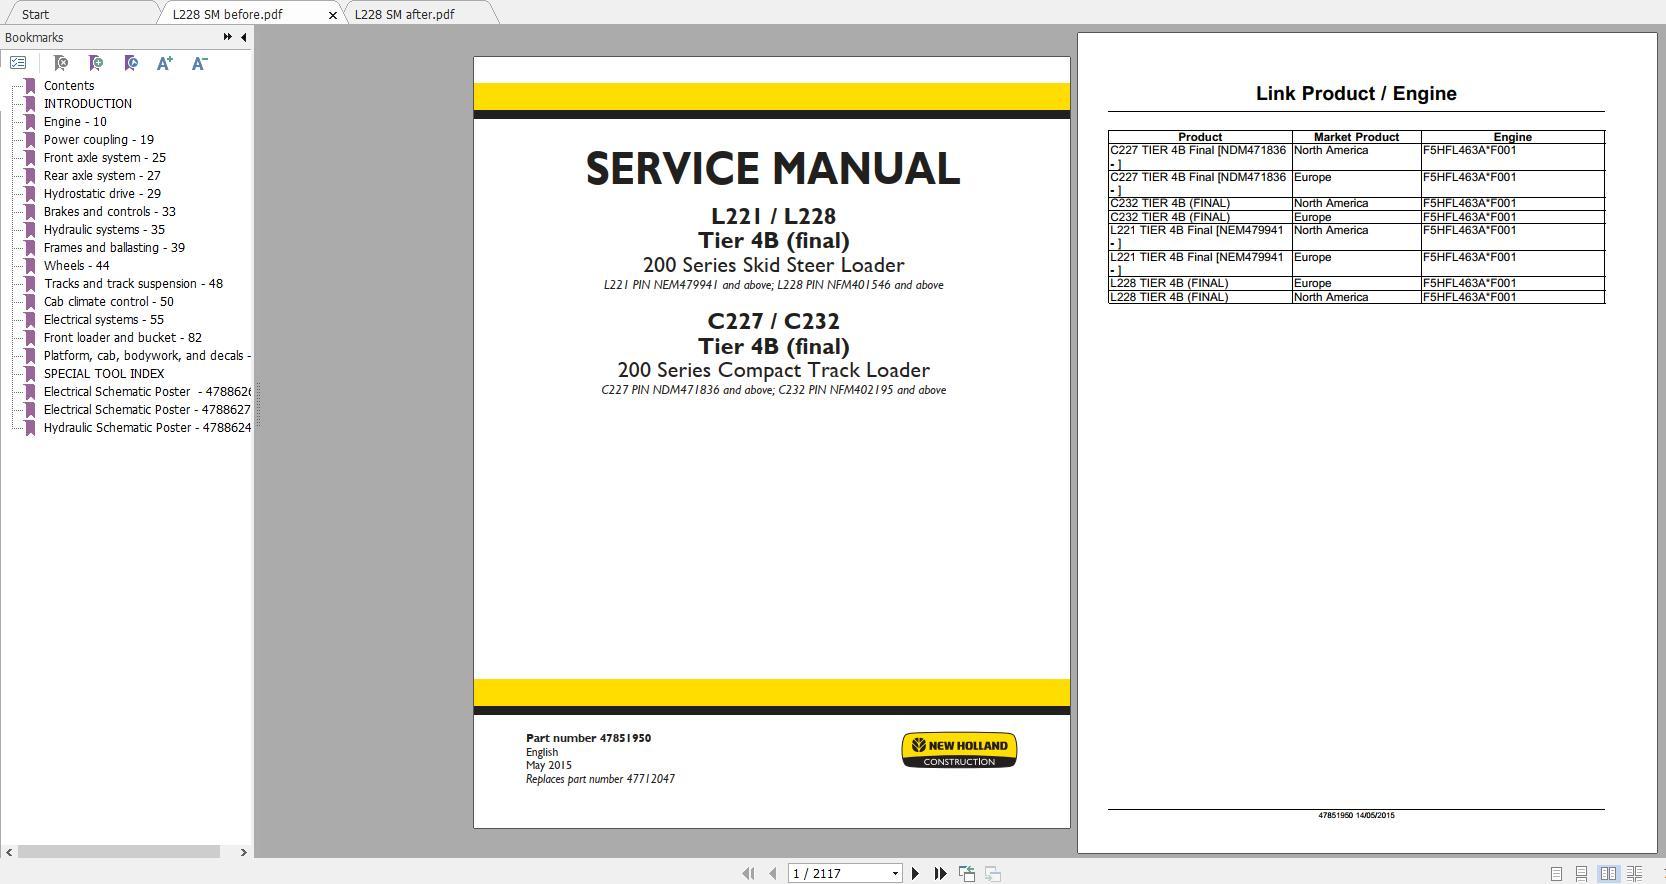 New Holland Skid Steer Loader L221 – L228, C227 – C237 Tier 4B(Final) Service Manual